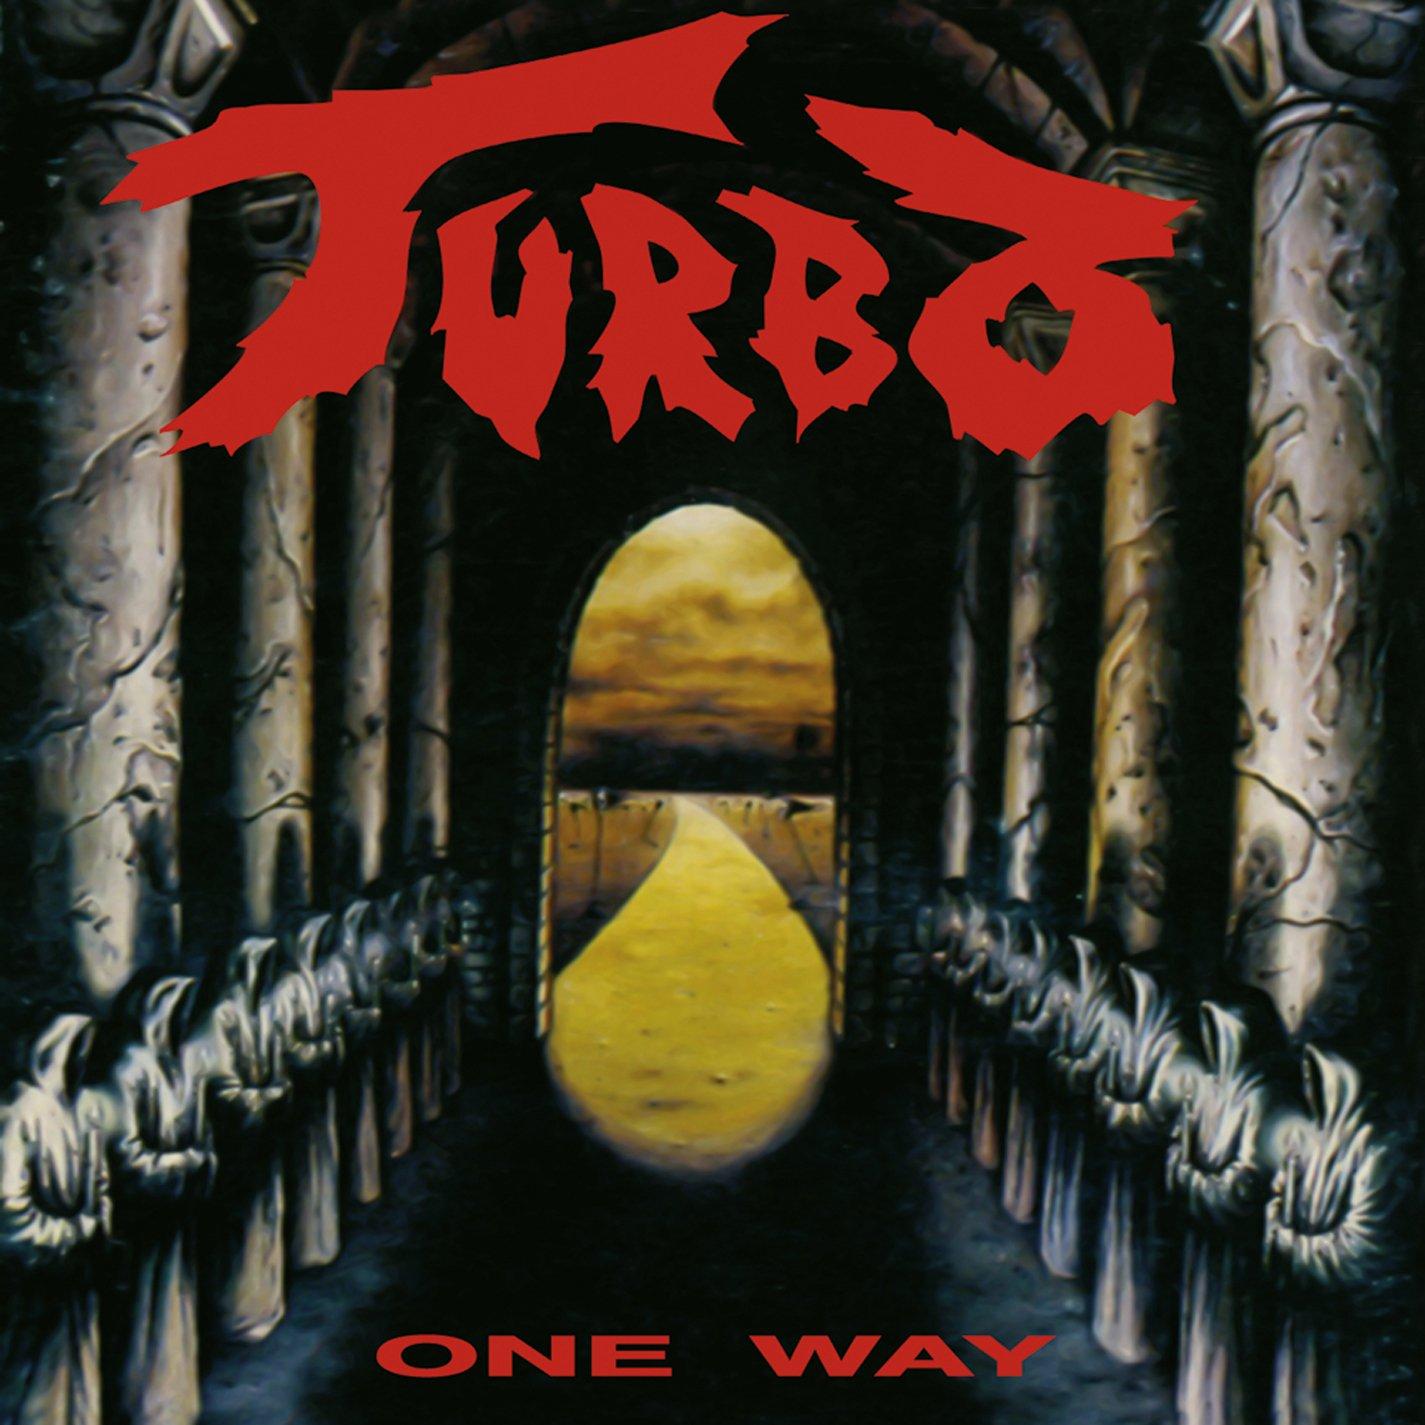 Turbo-One Way-(MMP CD 0631 DG)-REMASTERED-CD-FLAC-2009-WRE